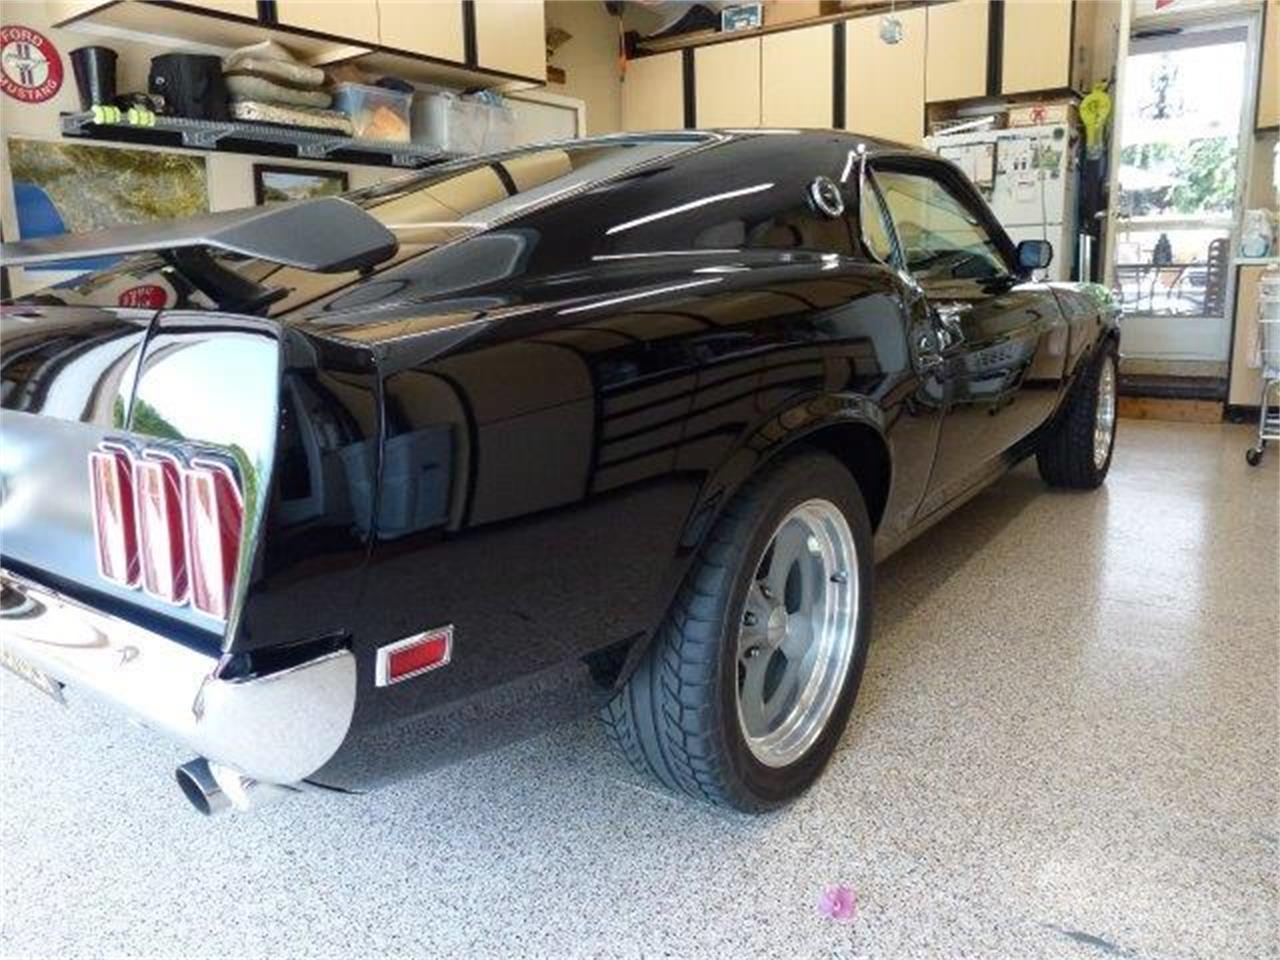 1969 Ford Mustang Mach 1 (CC-1242541) for sale in San Jaun Capistrano, California